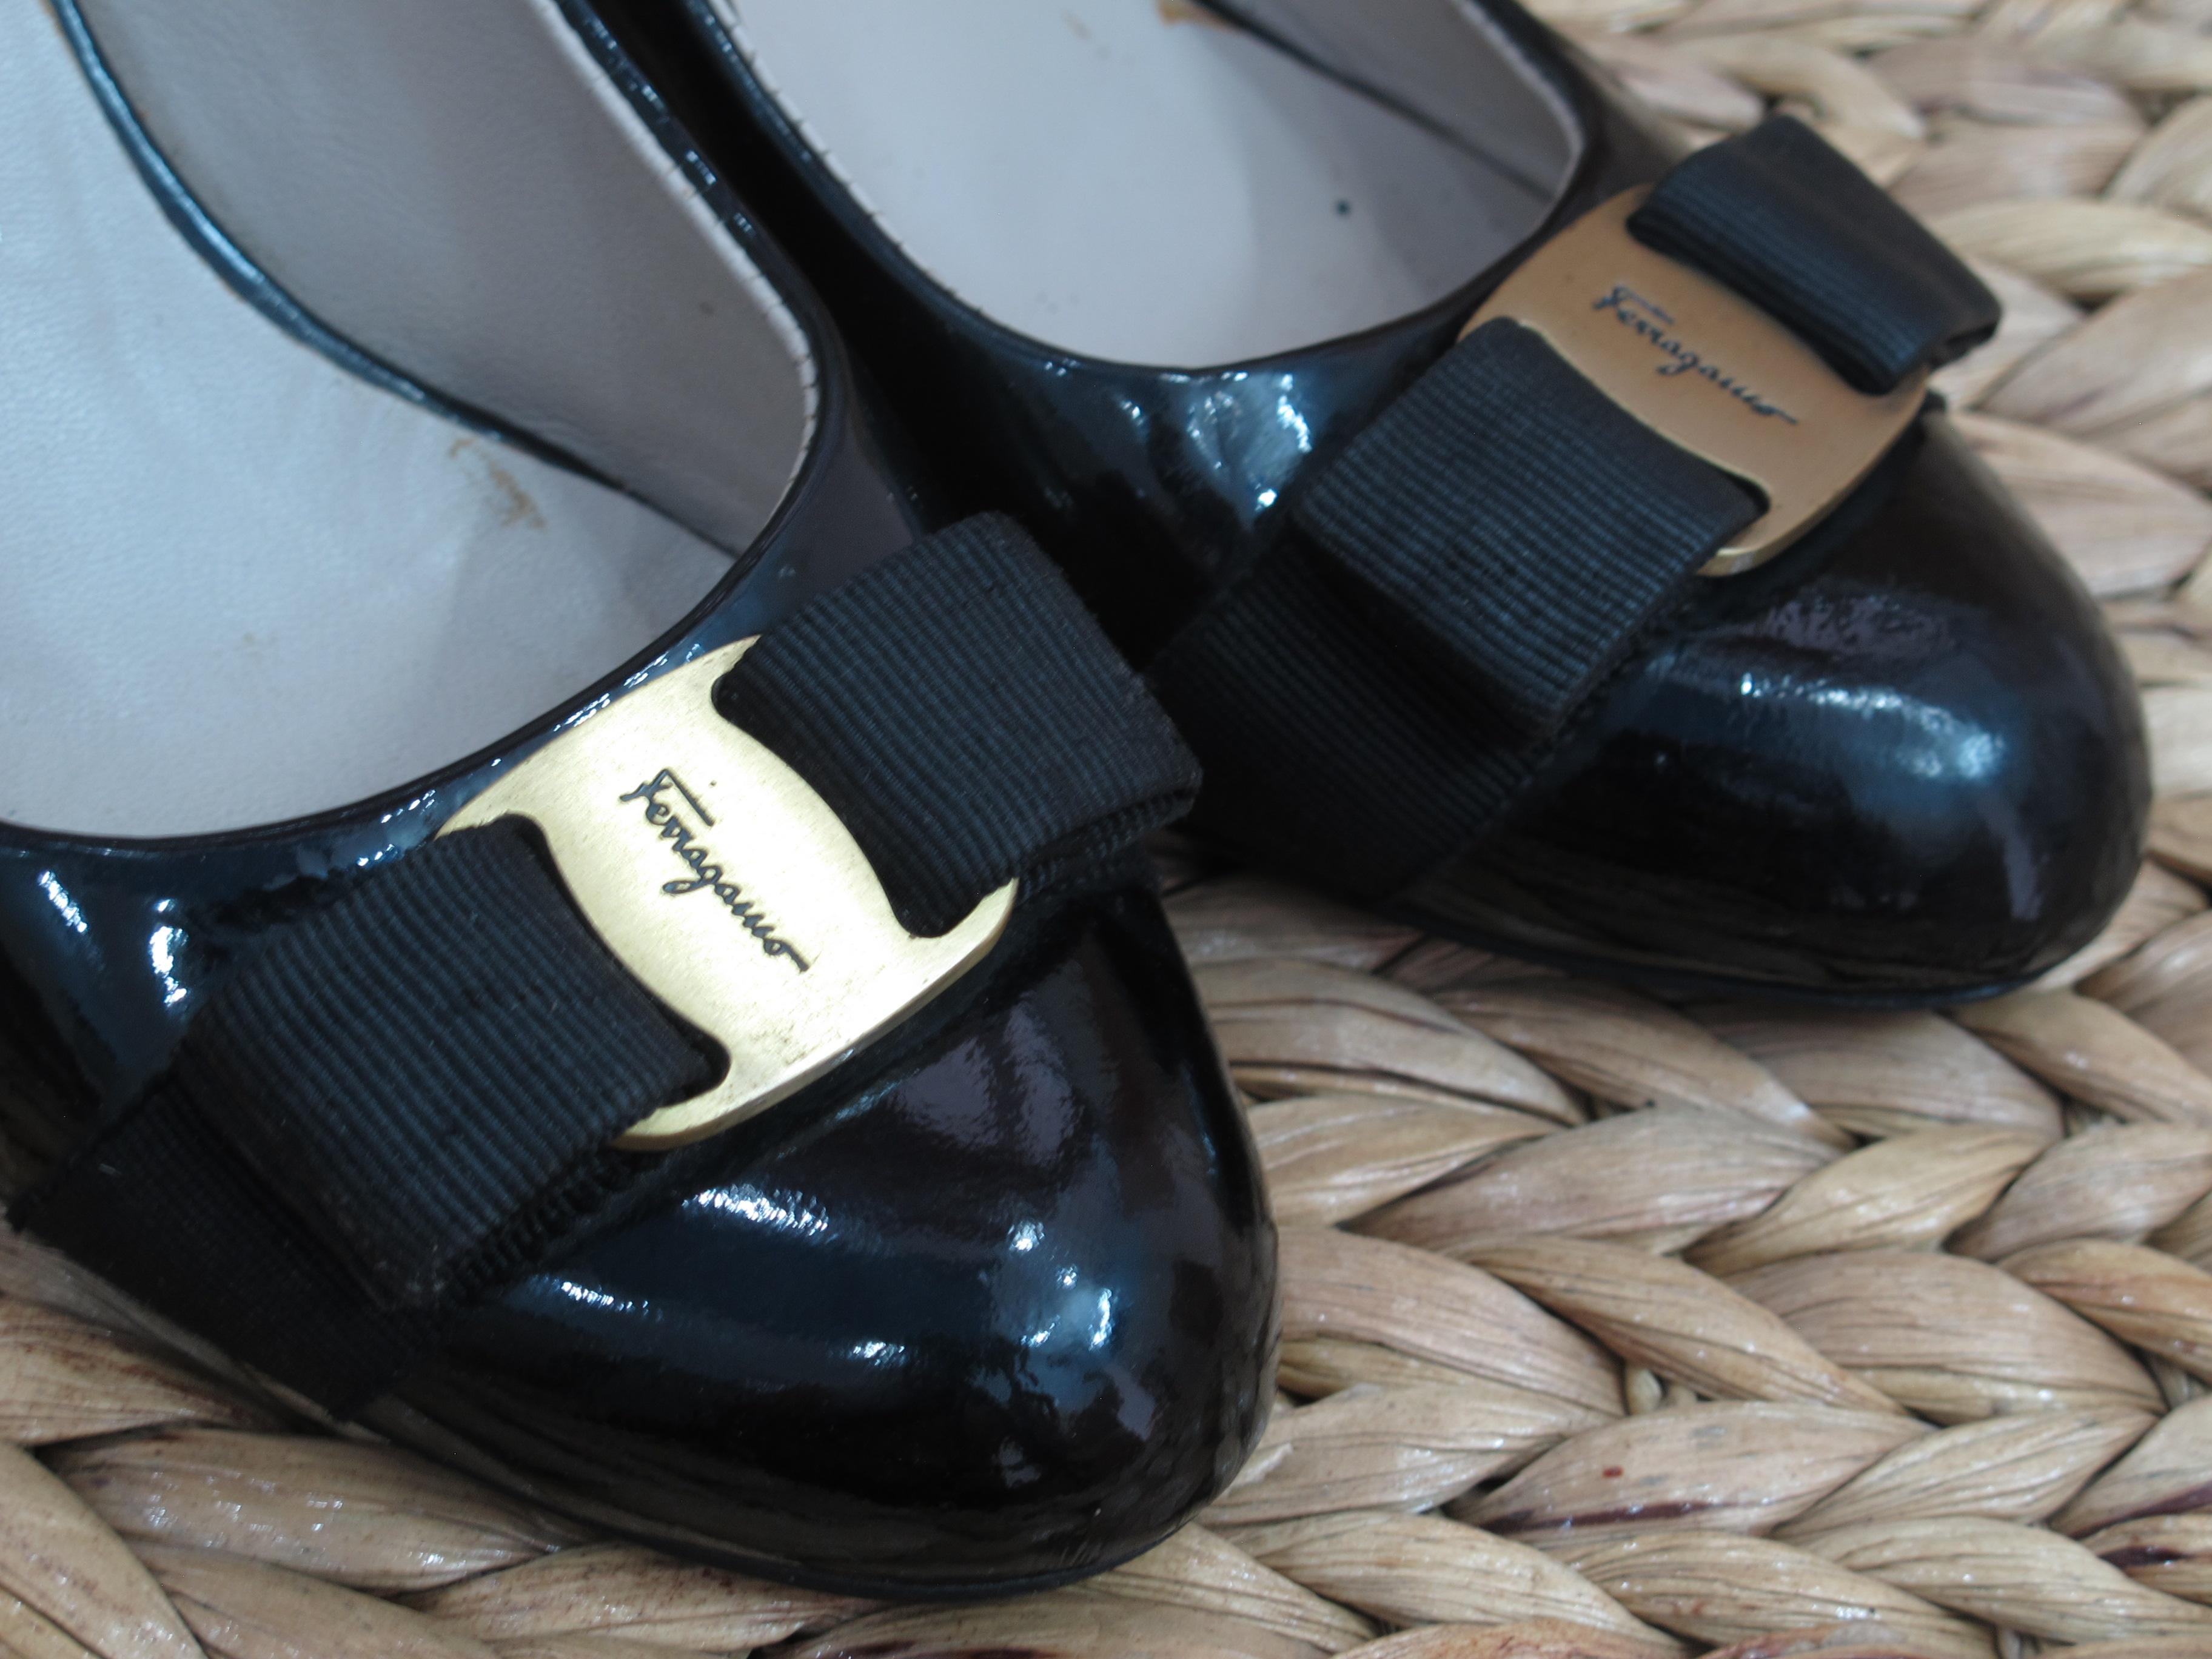 7 Giày Salvatore Ferragamo Nữ Tóp Luxury like new giá rẻ Chuẩn Authentic